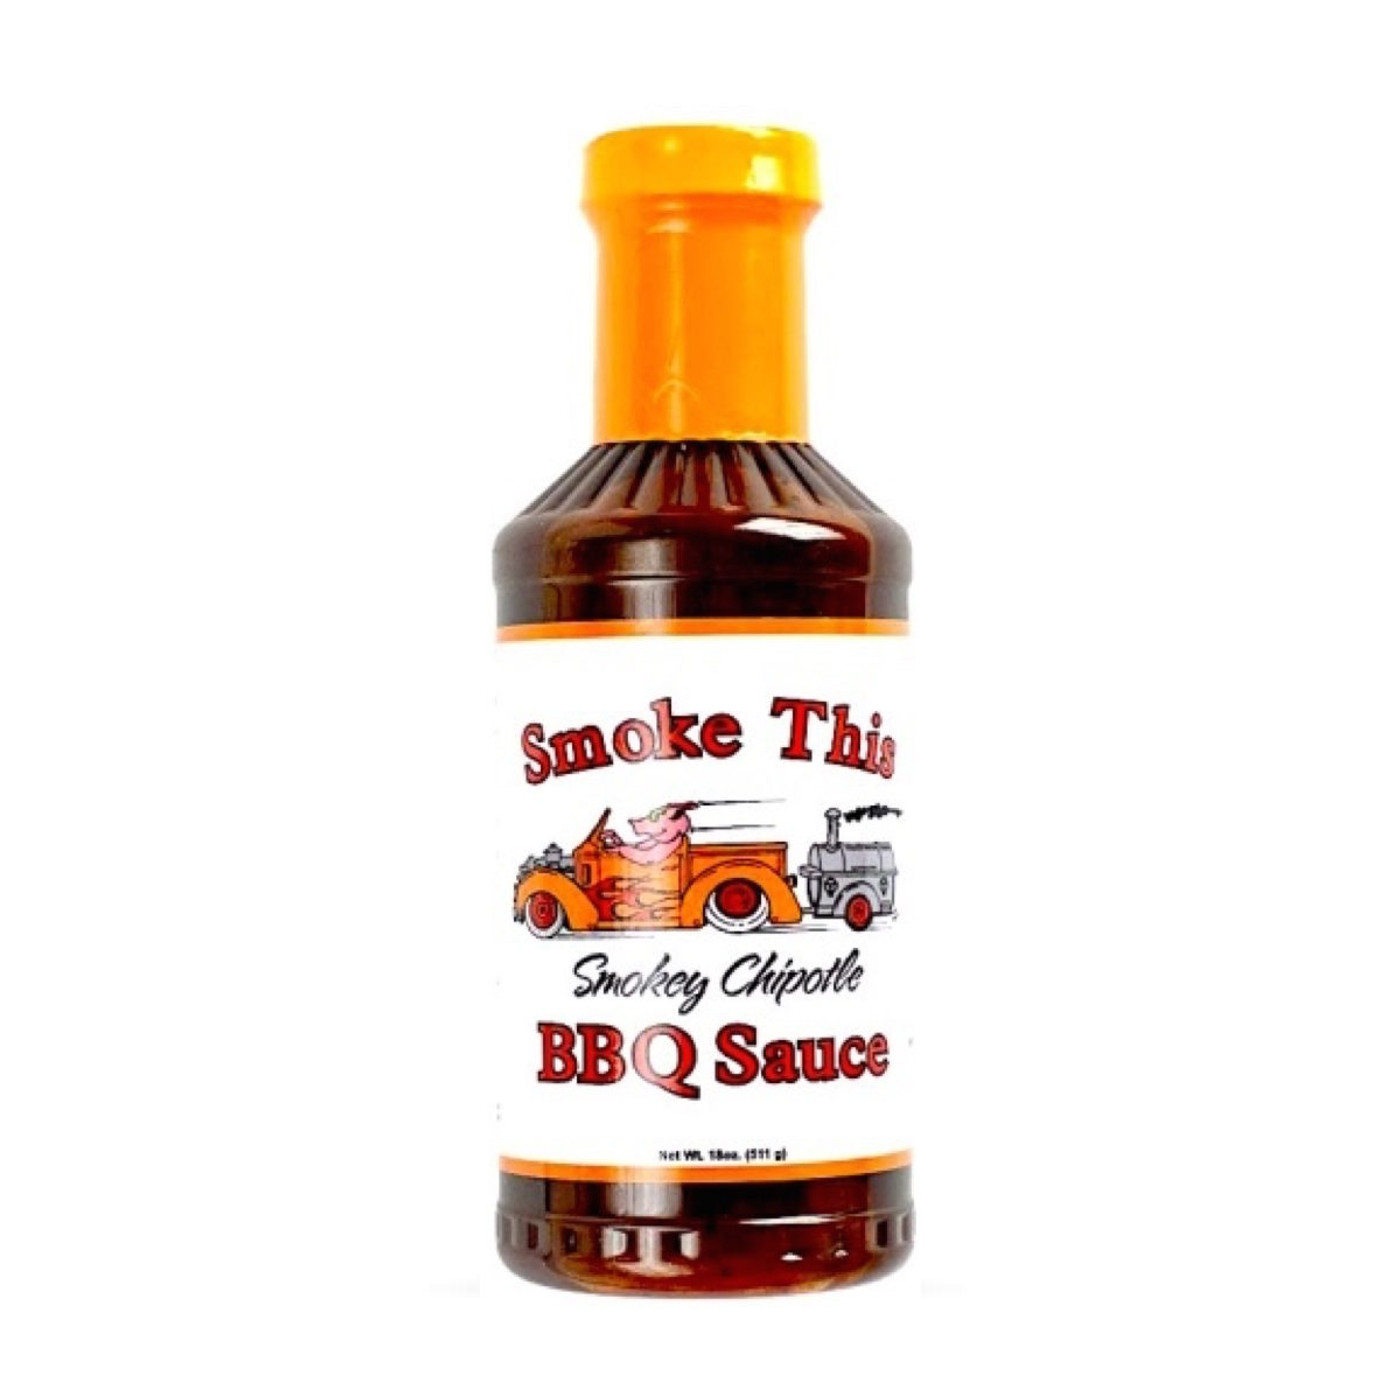 Smoke This BBQ  - Smokey Chipotle Sauce